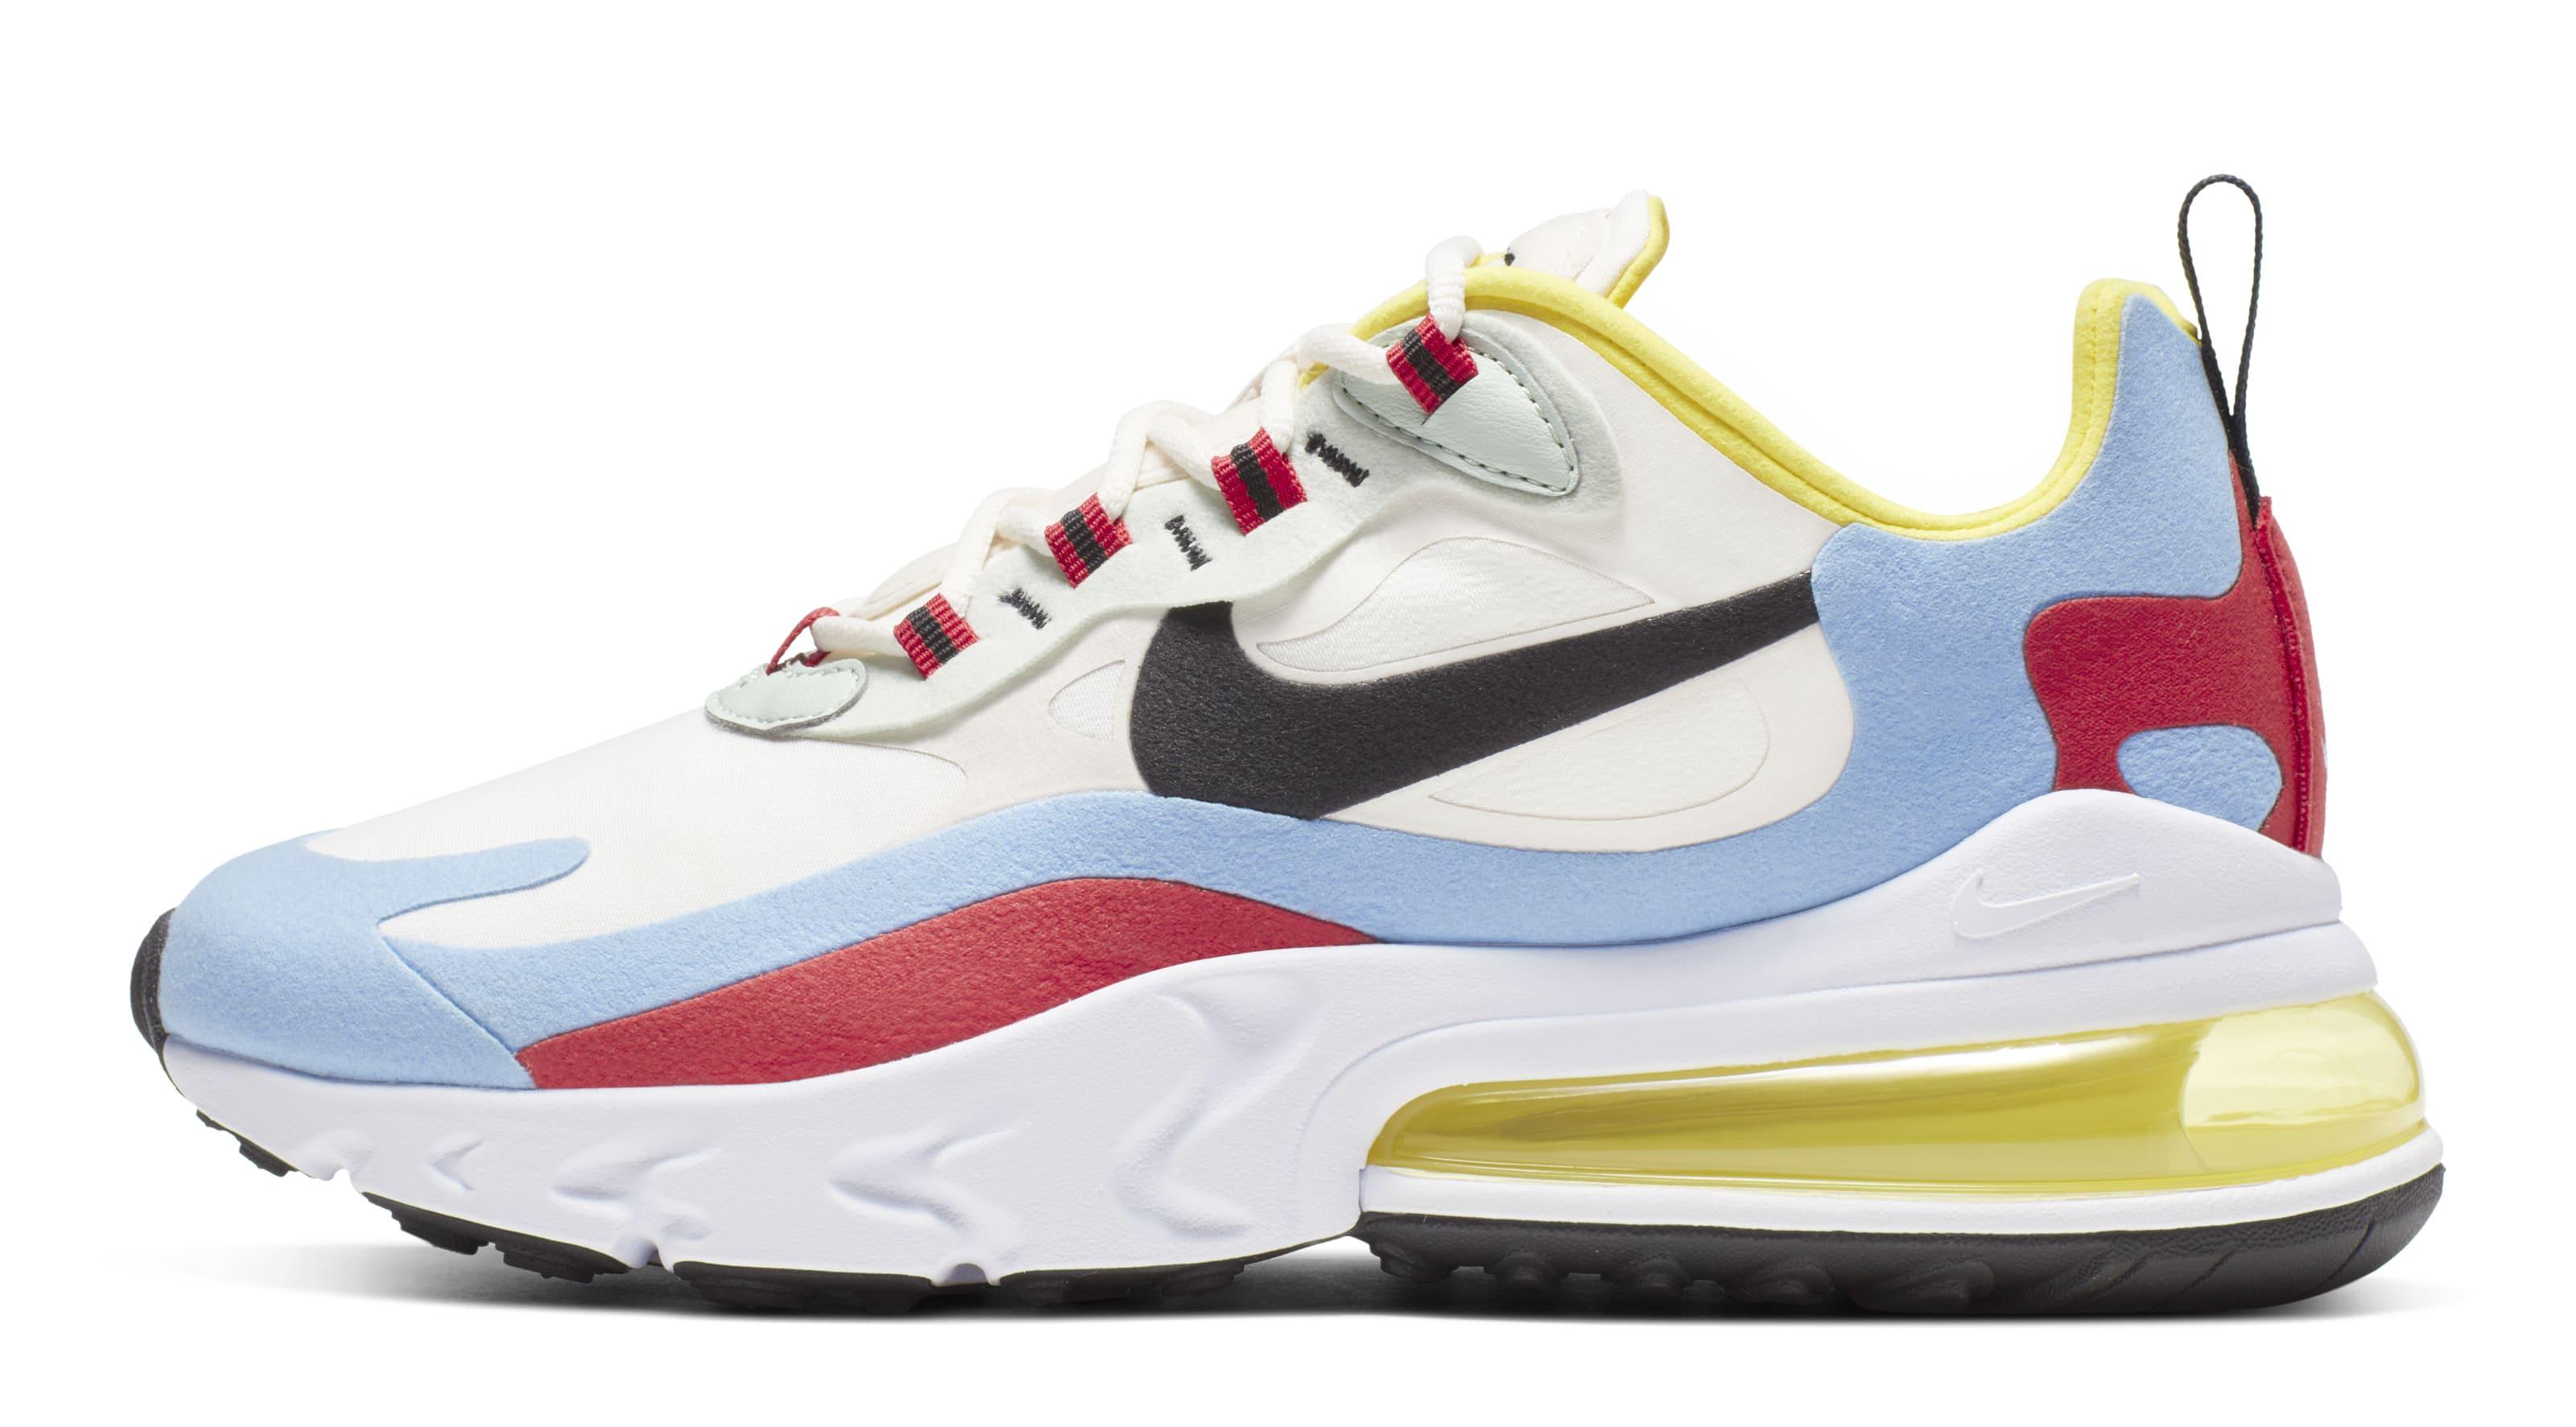 Nike Air Max 270 React WMNS (Lateral)